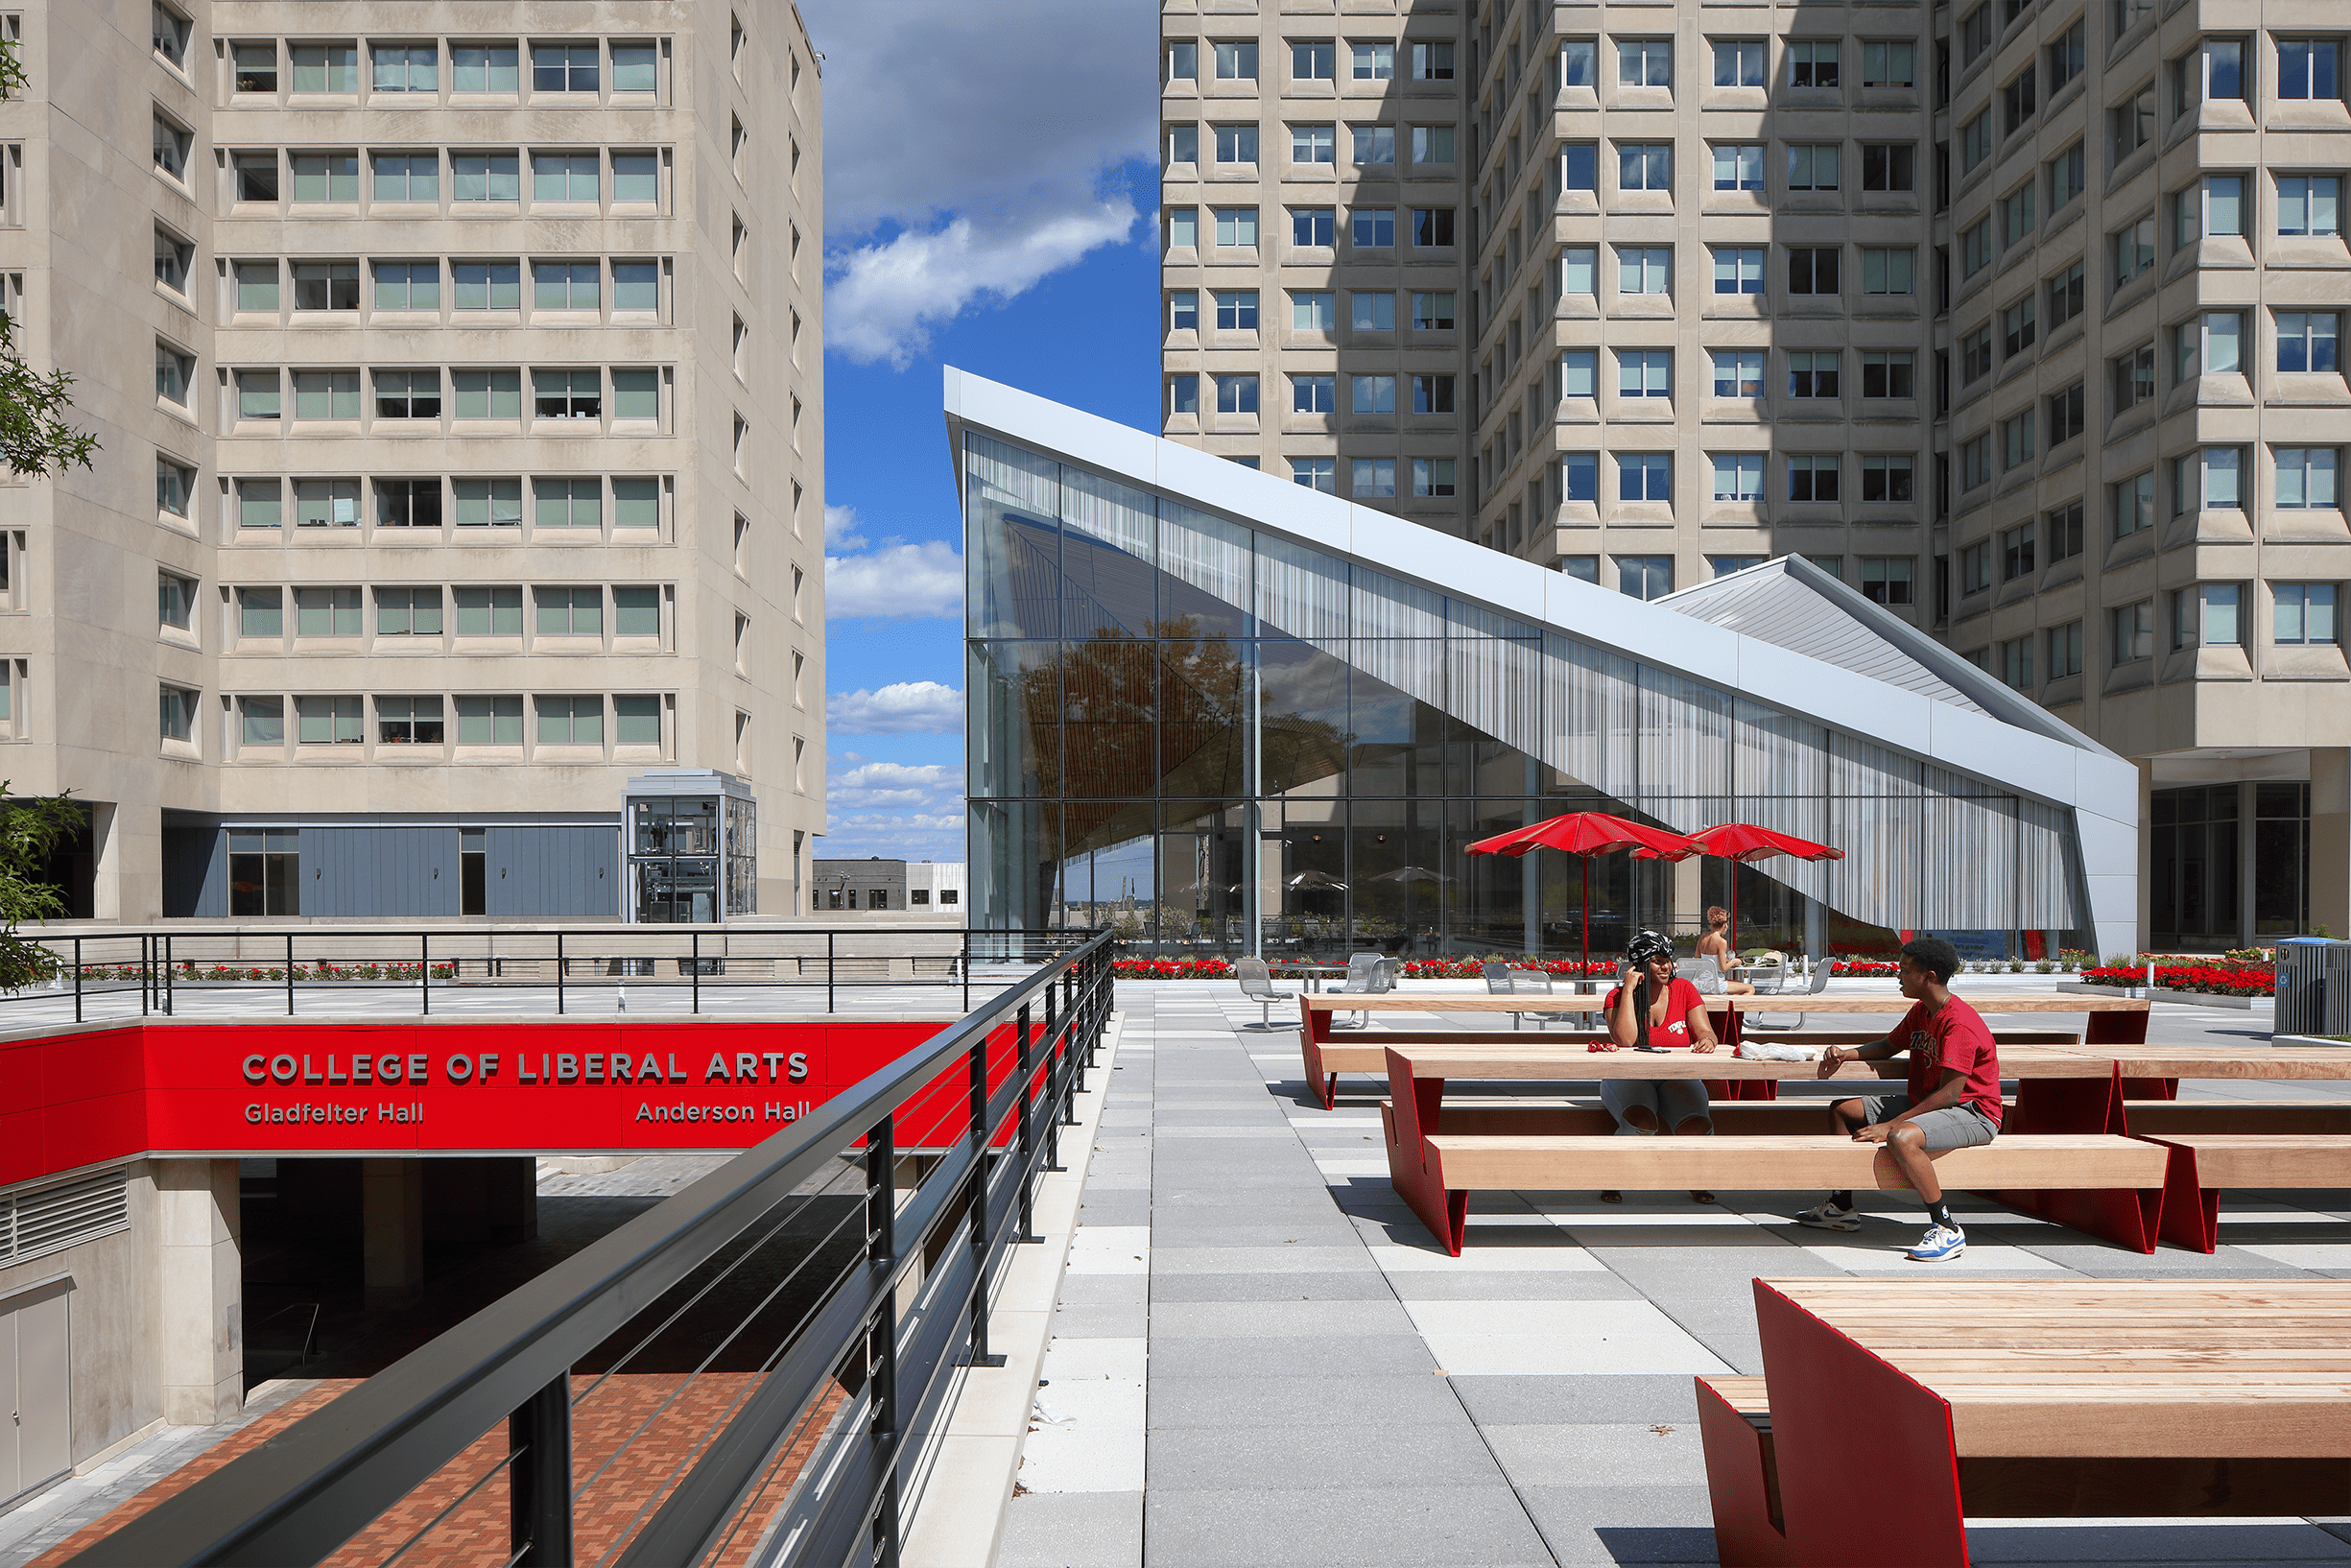 photo of Anderson Hall exterior atrium